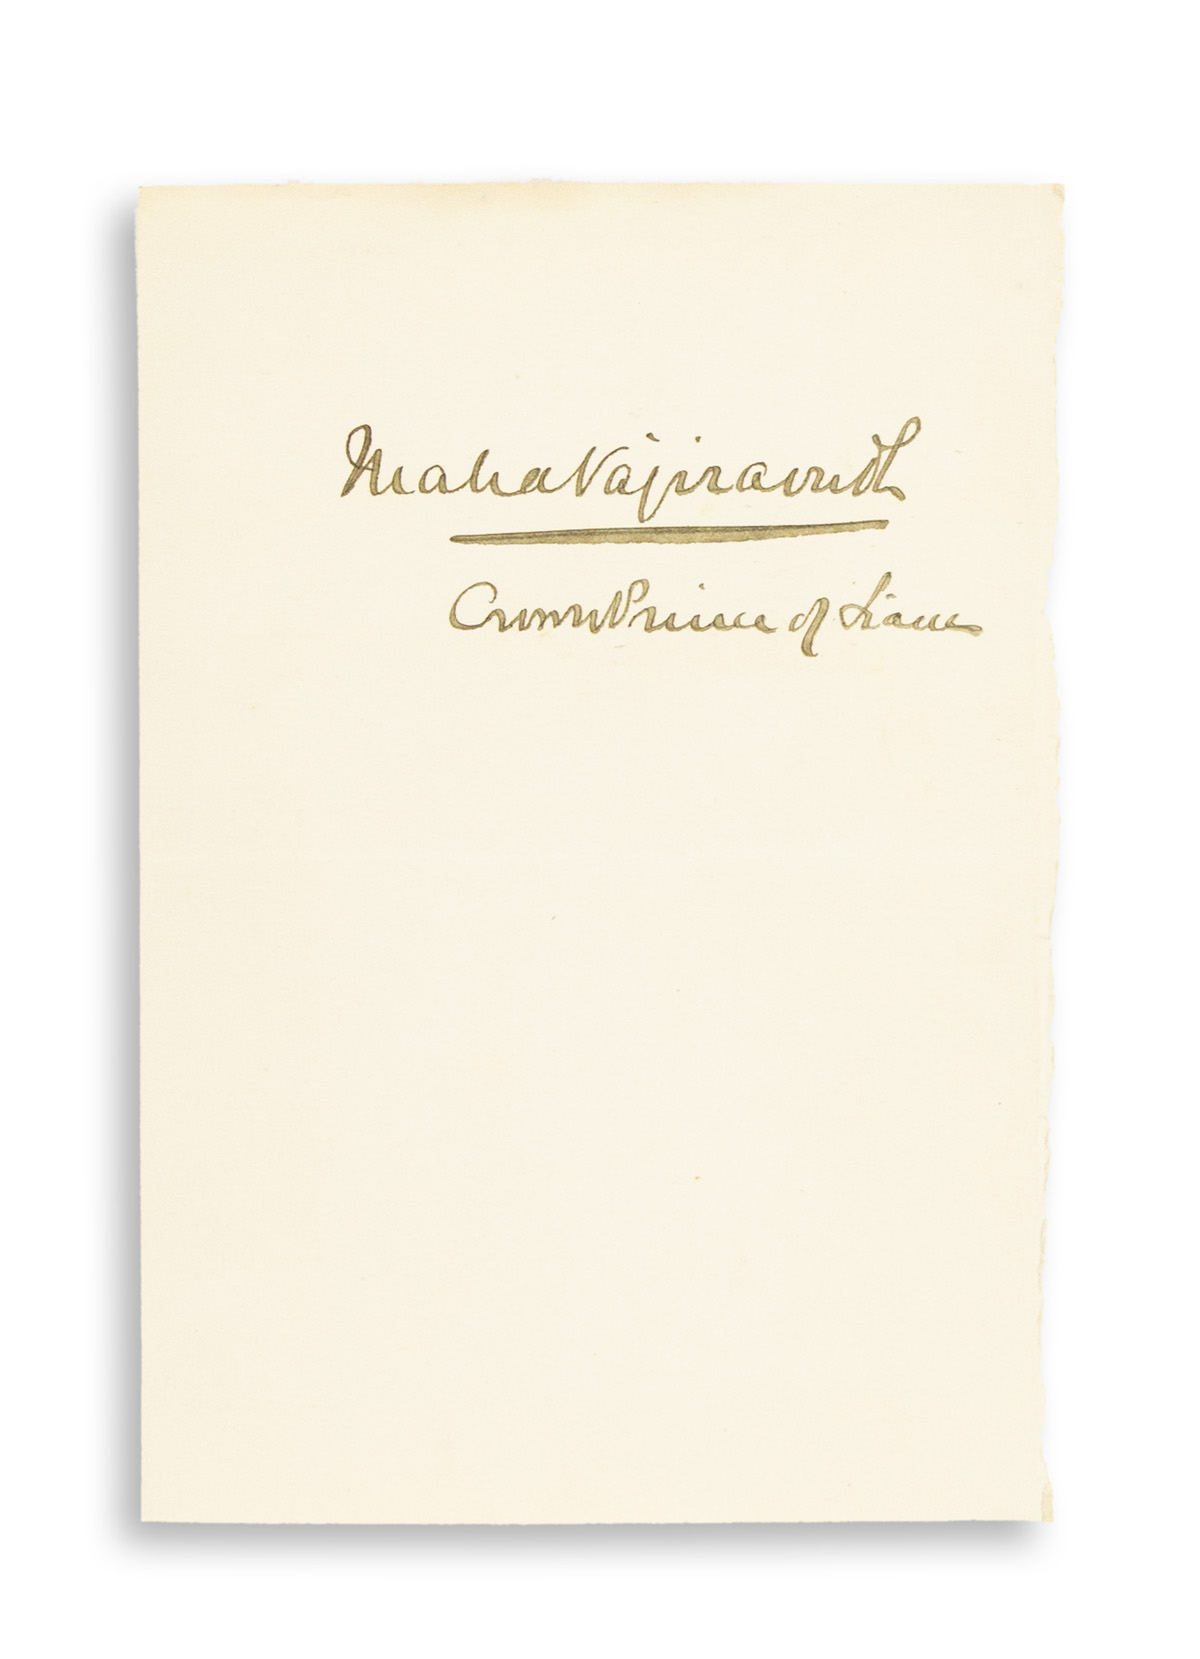 VAJIRAVUDH;-KING-OF-SIAM-Signature-MahaVajiravudh--CrownPrin